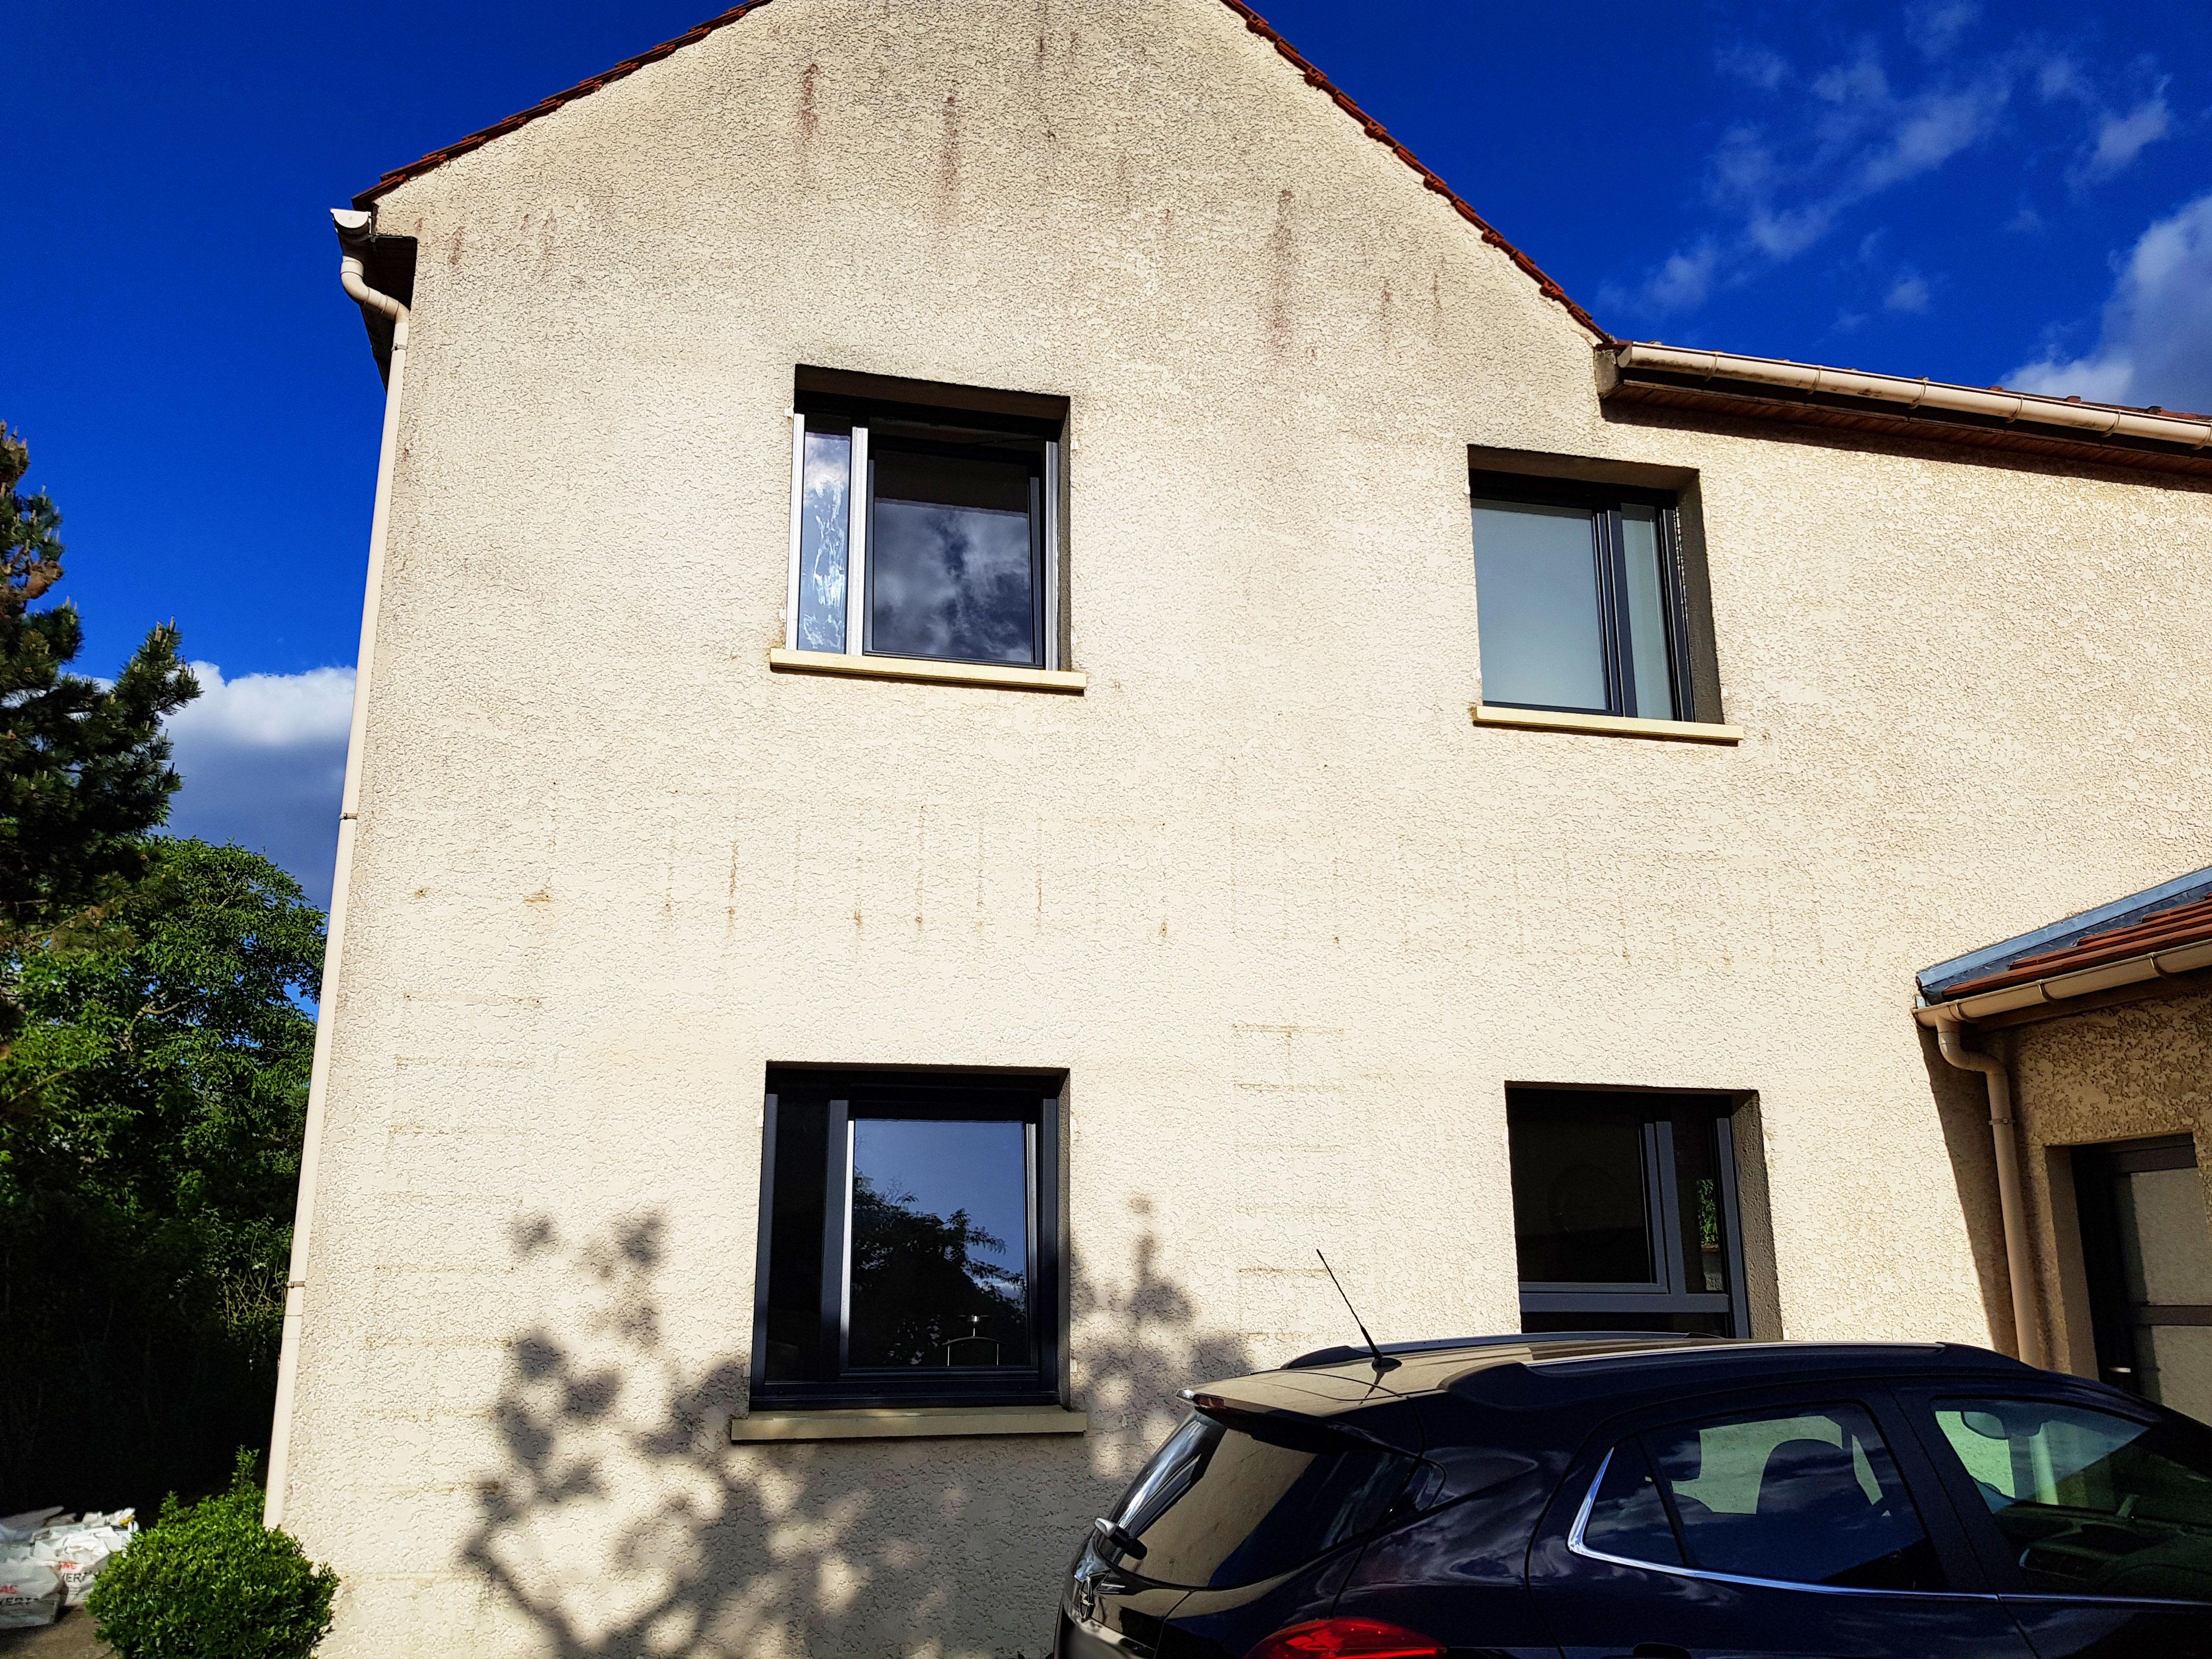 Fenêtres oscillo battant façade maison côté rue